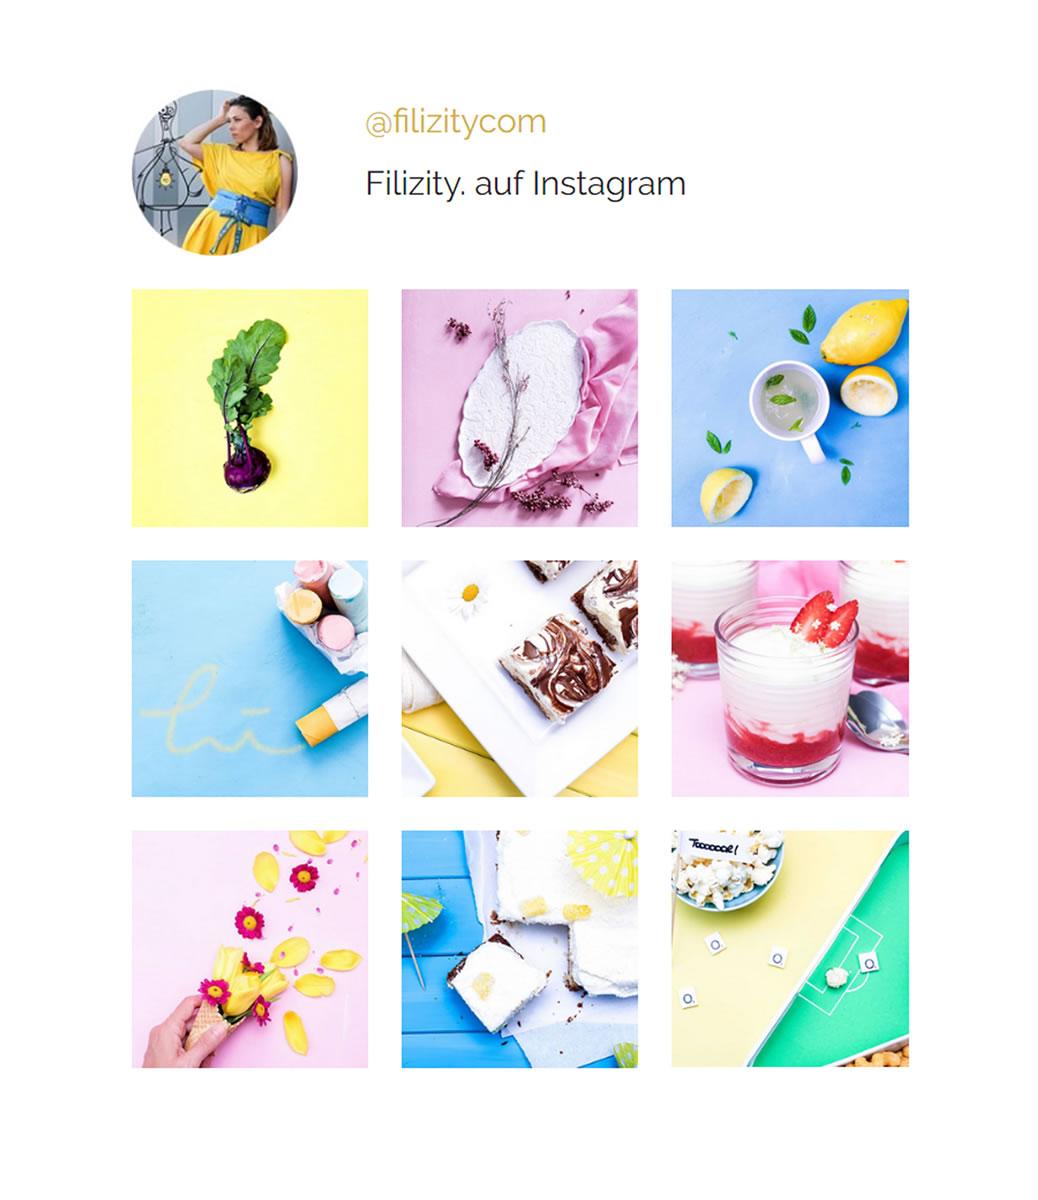 a9f4551263e2 DSGVO-konformes Instagram Widget Mockup